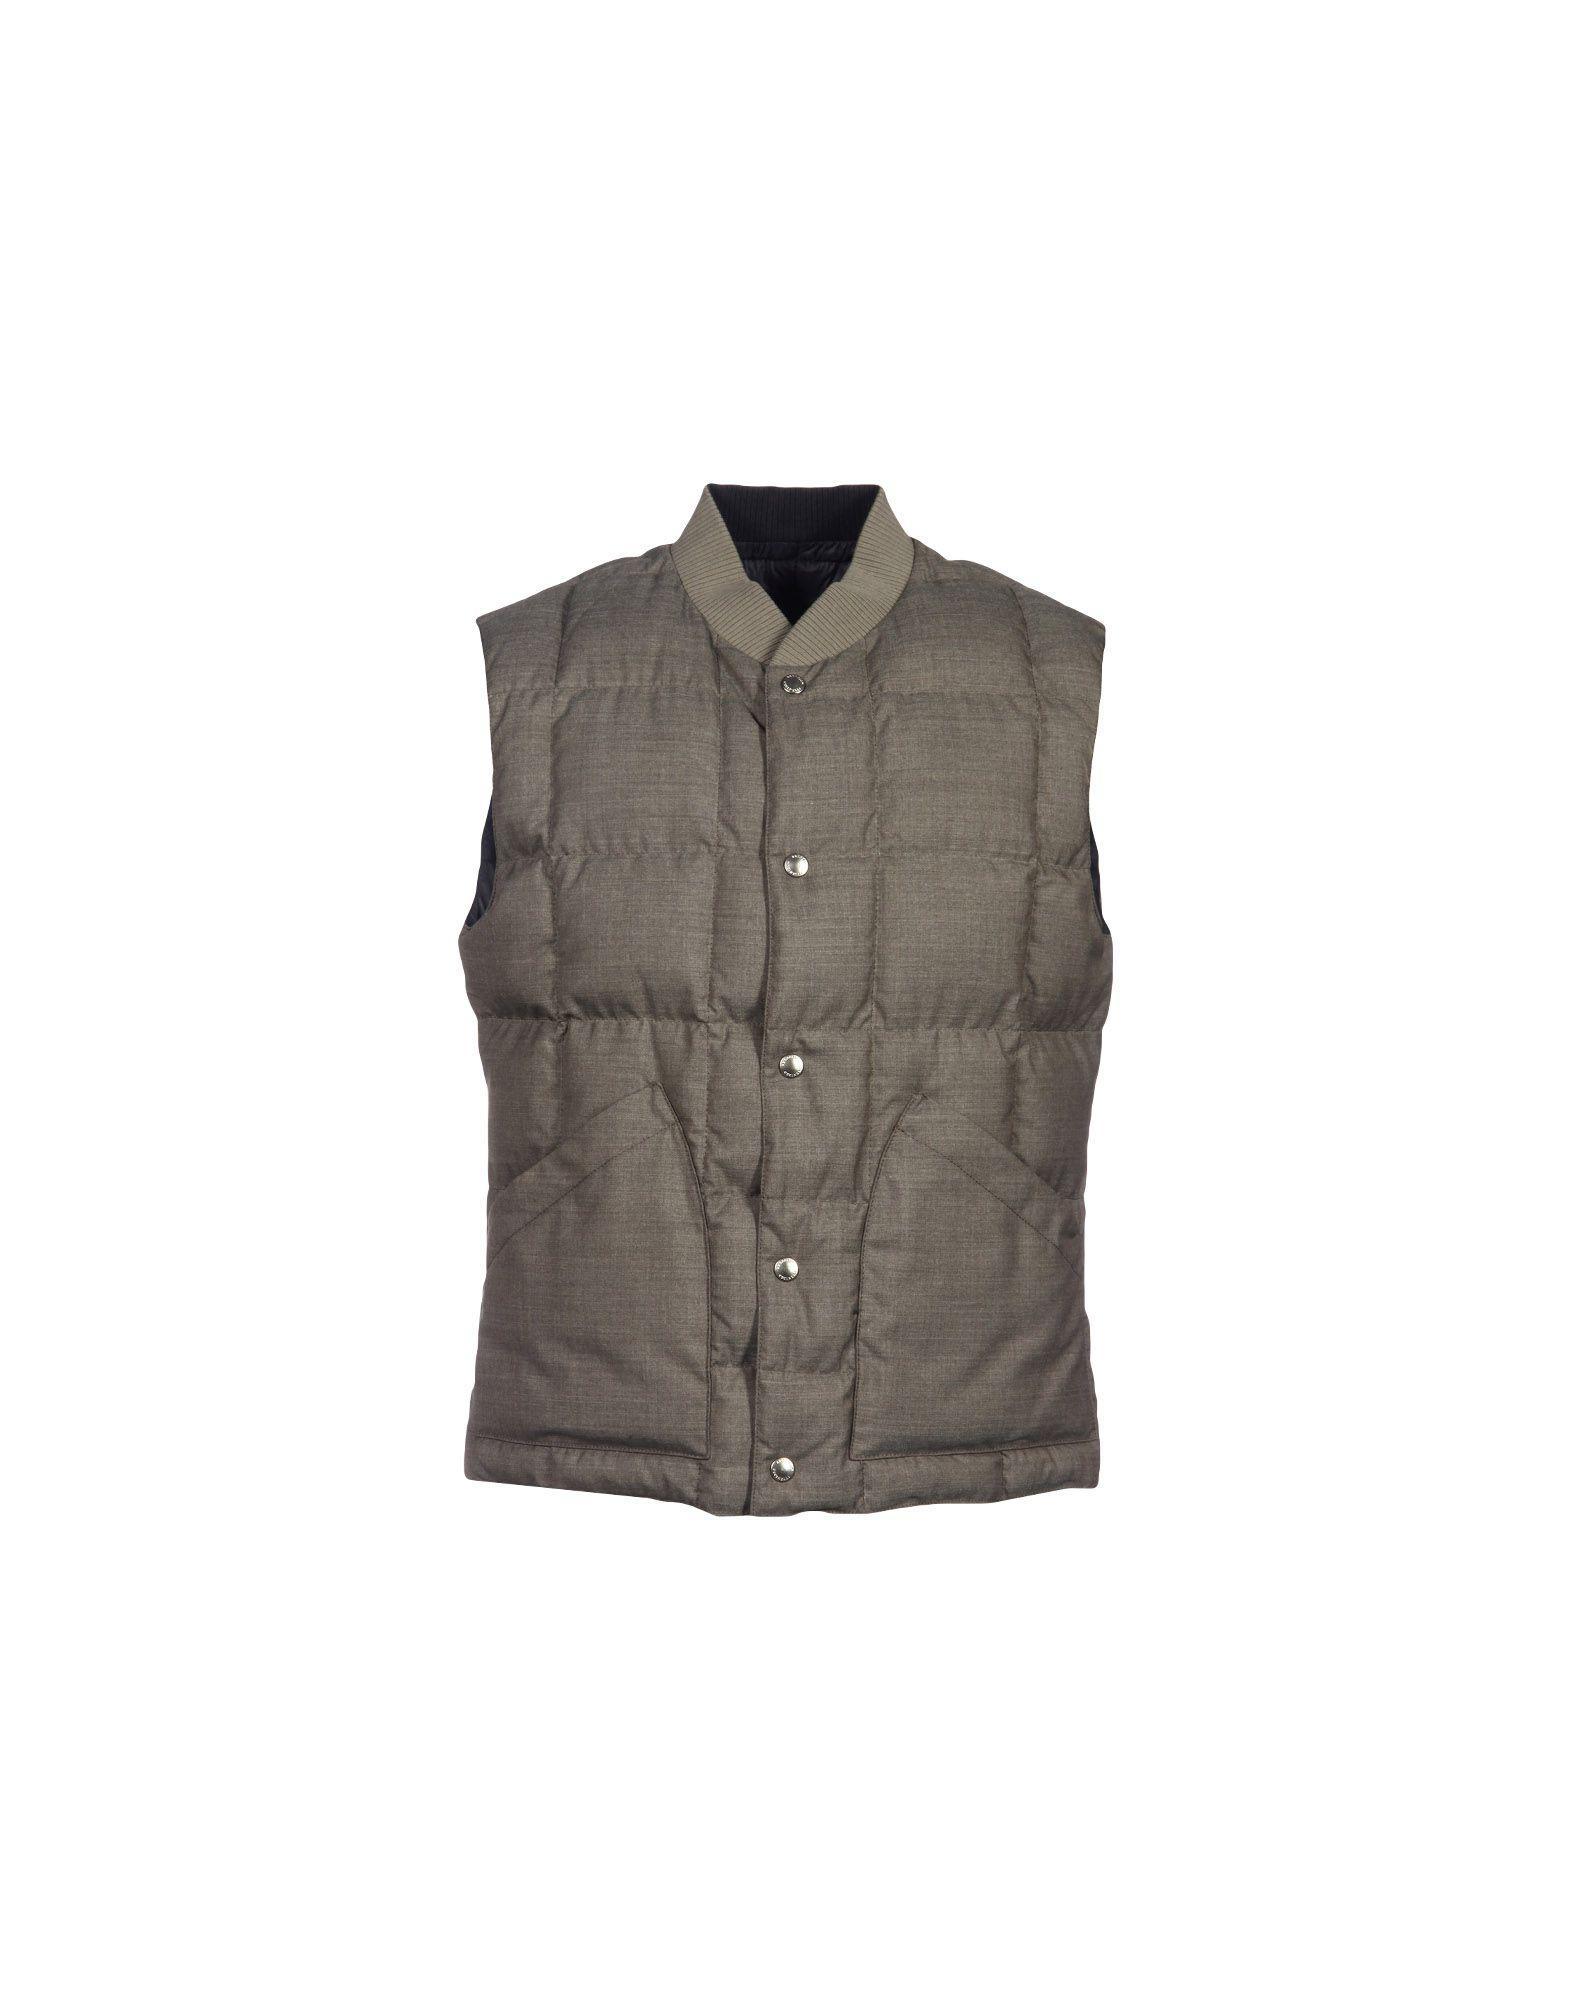 Brunello Cucinelli Down Jackets In Dove Grey